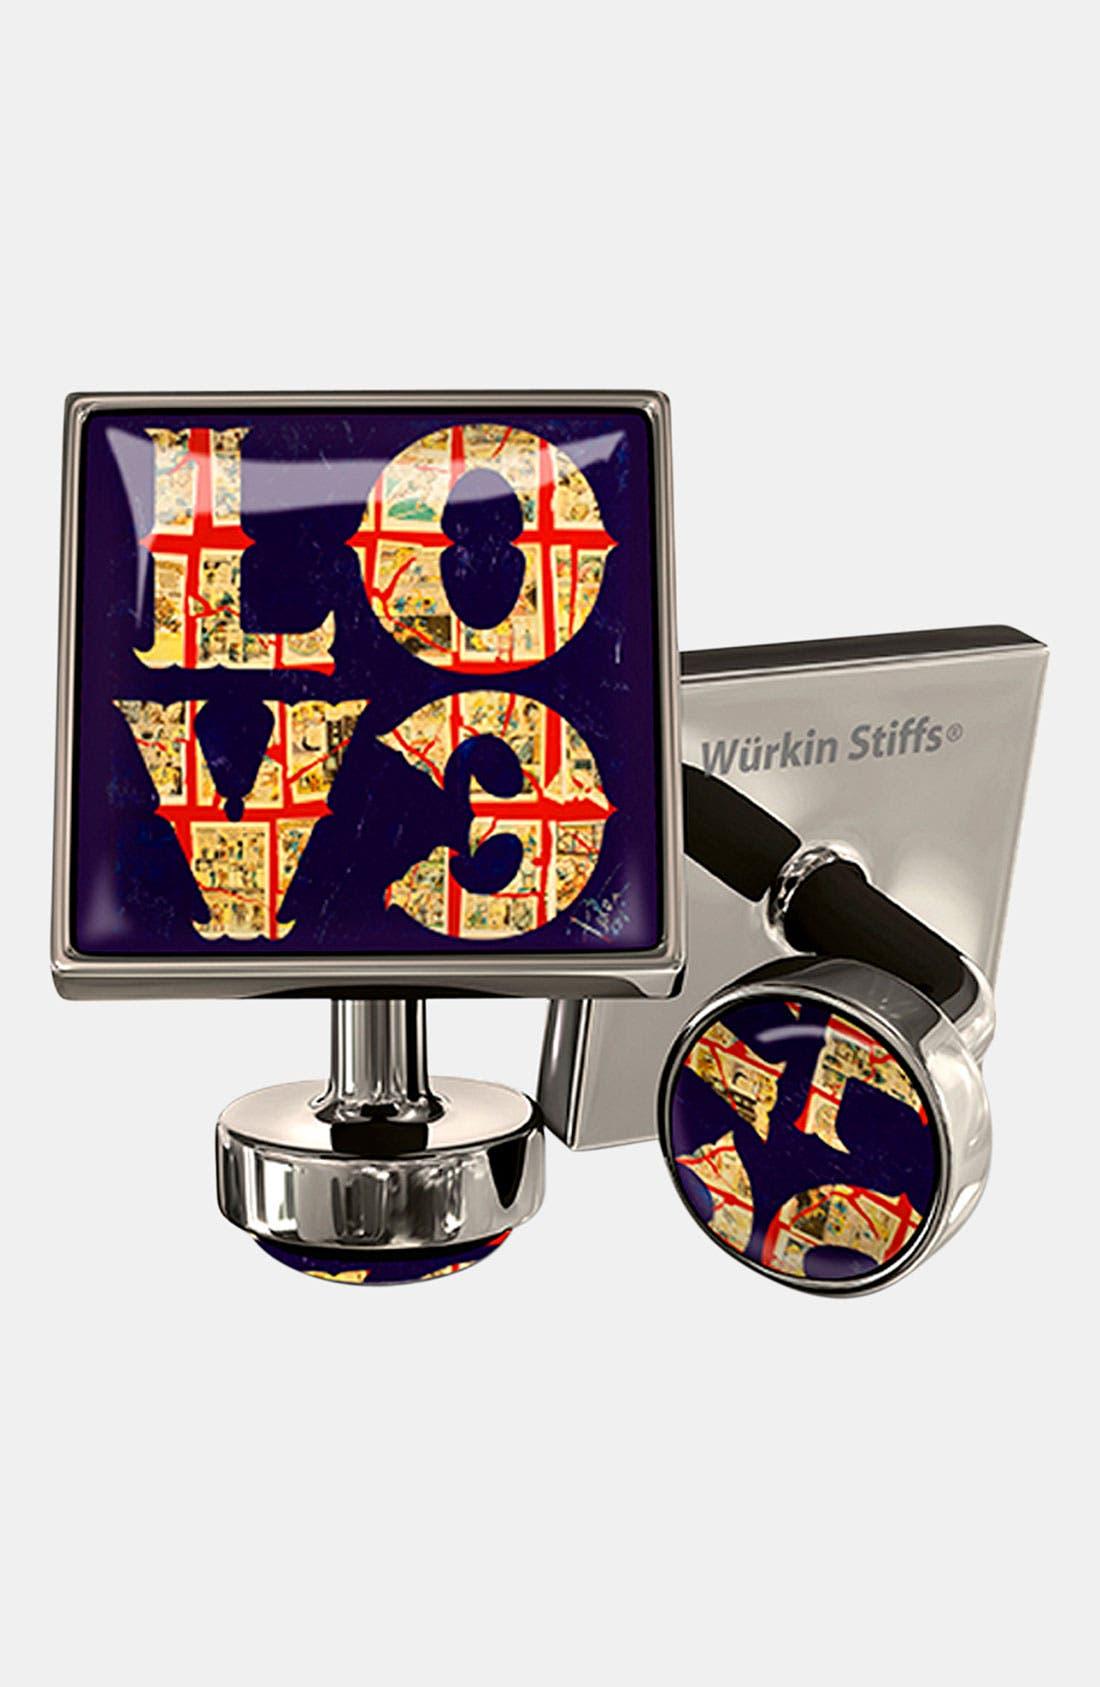 Main Image - Würkin Stiffs 'Love' Square Cuff Links